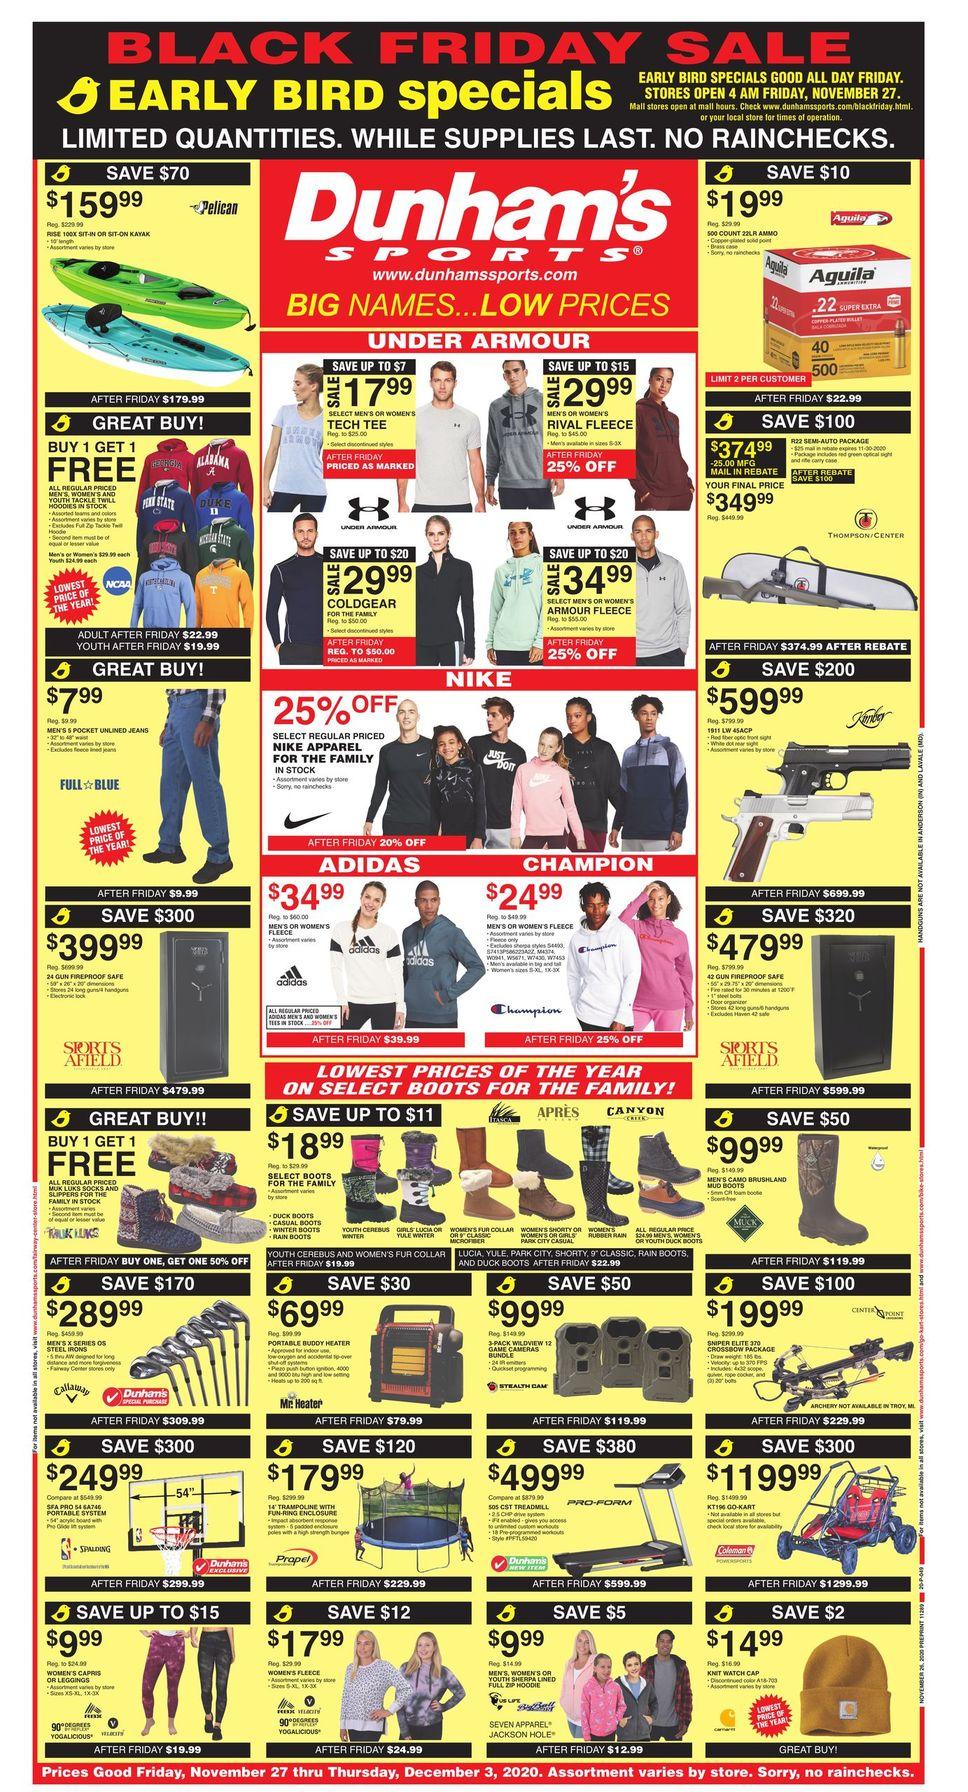 Dunham's Black Friday Sales Ad 2020